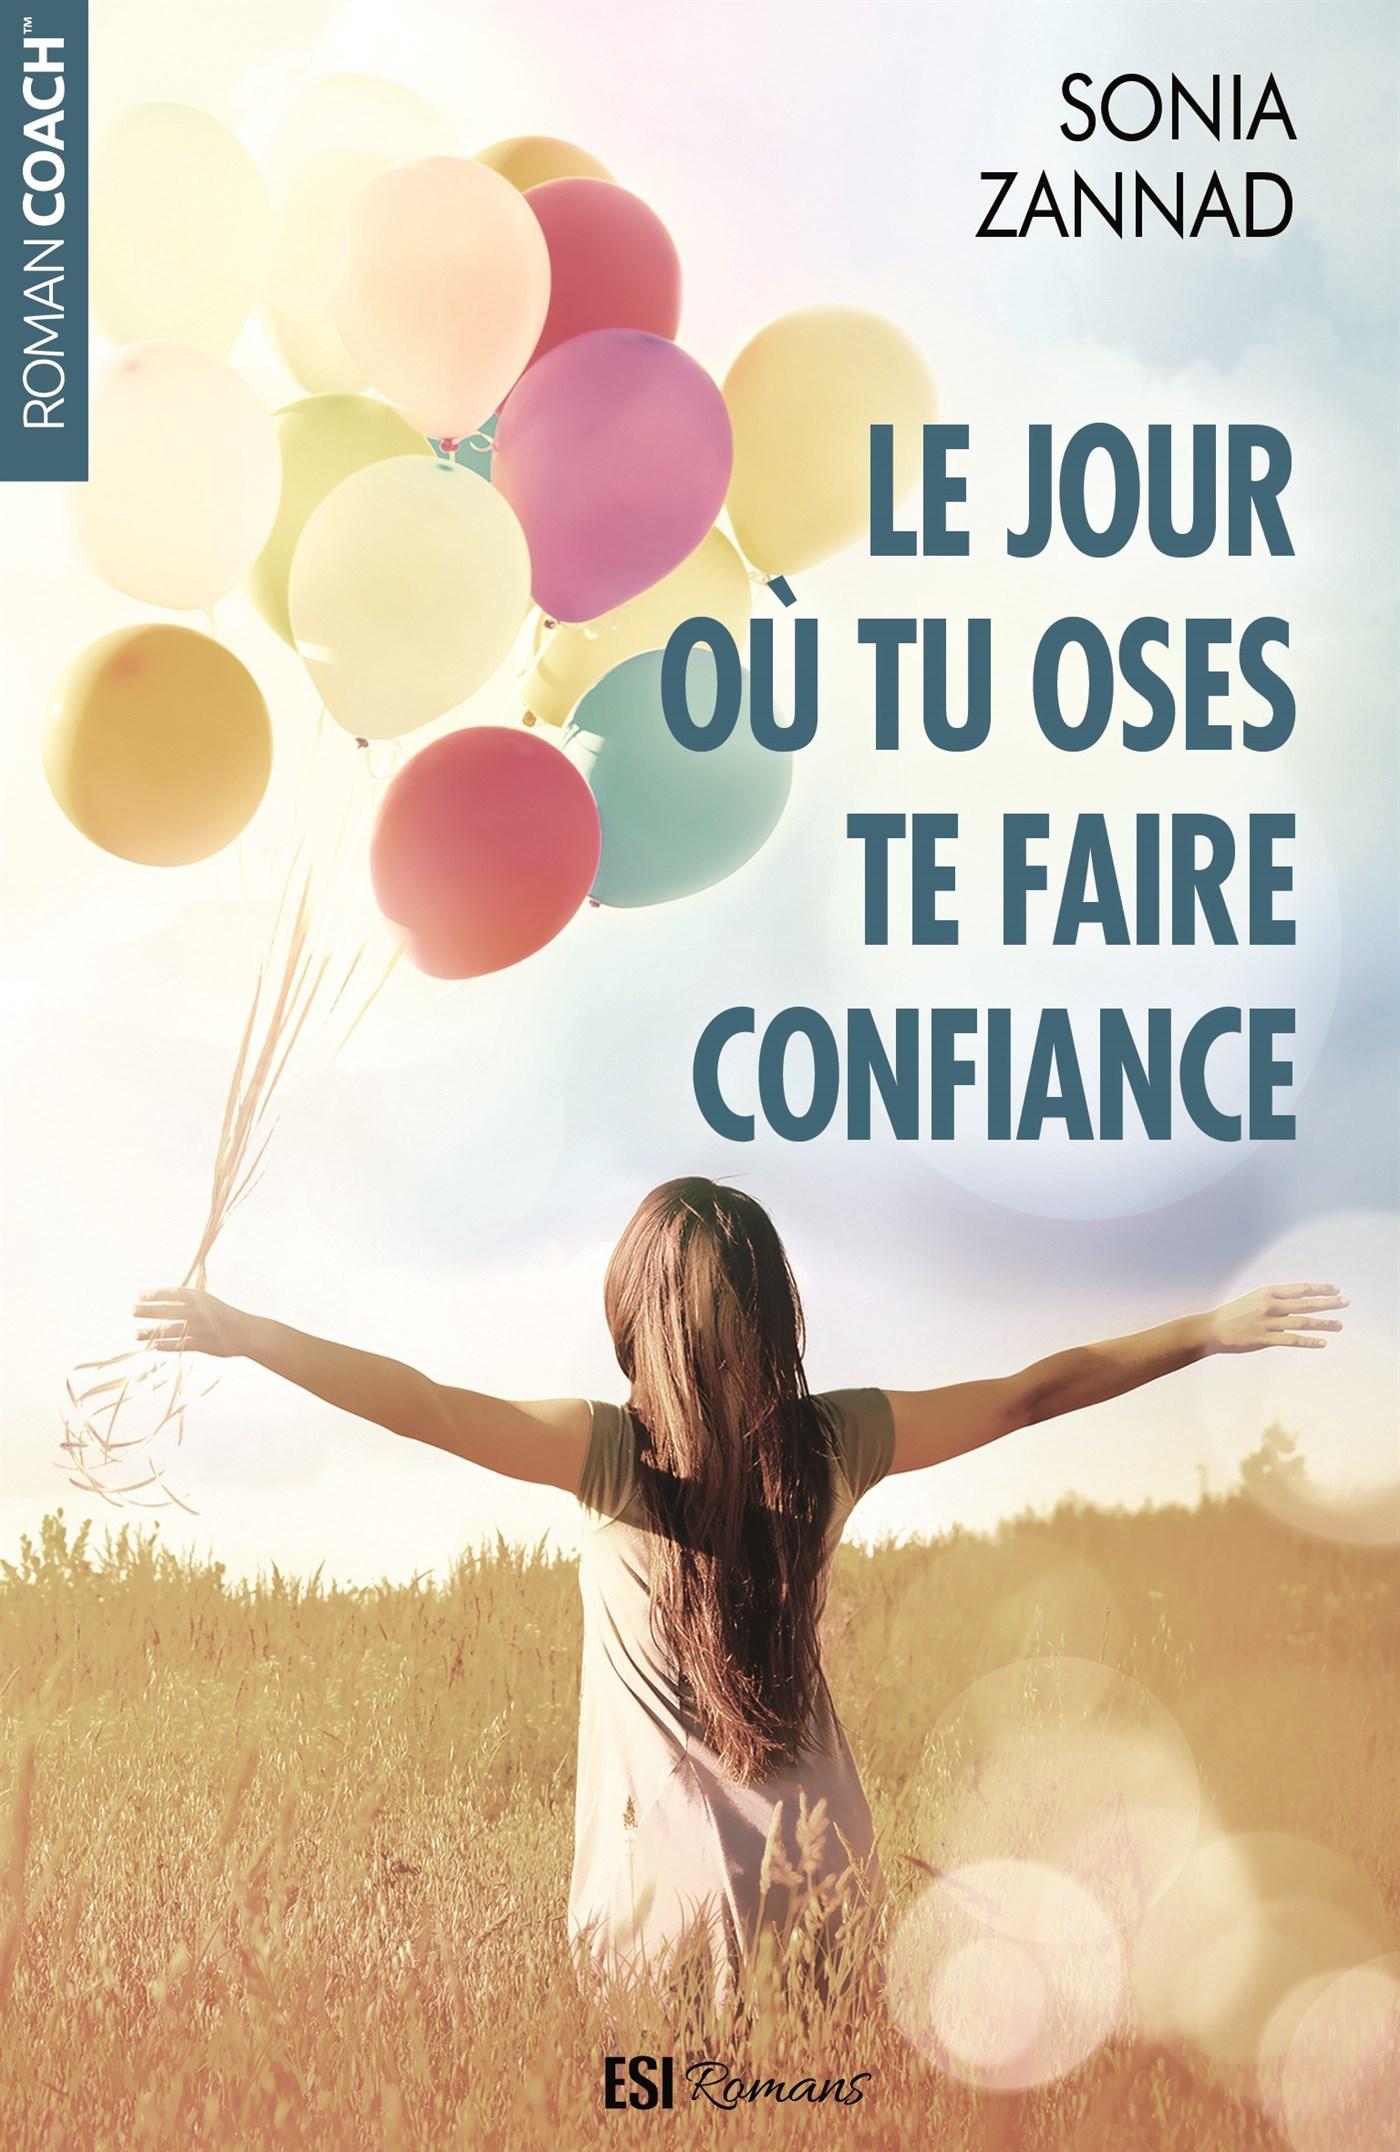 JOUR OU TU OSES TE FAIRE CONFIANCE (LE)